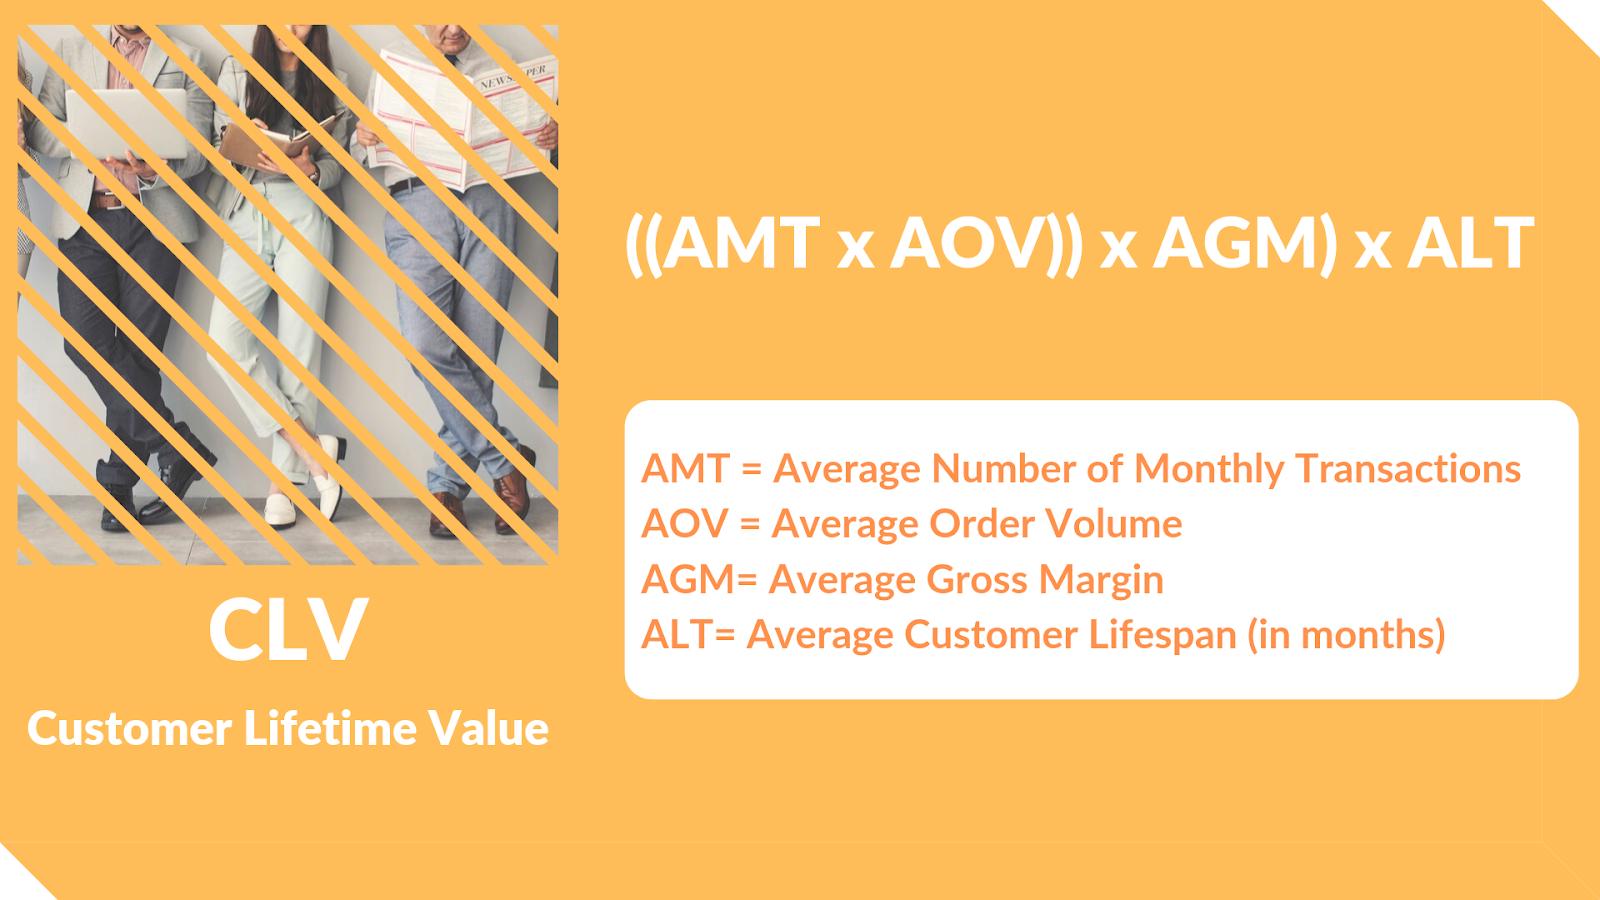 Customer Lifetime Value - customer loyalty metrics